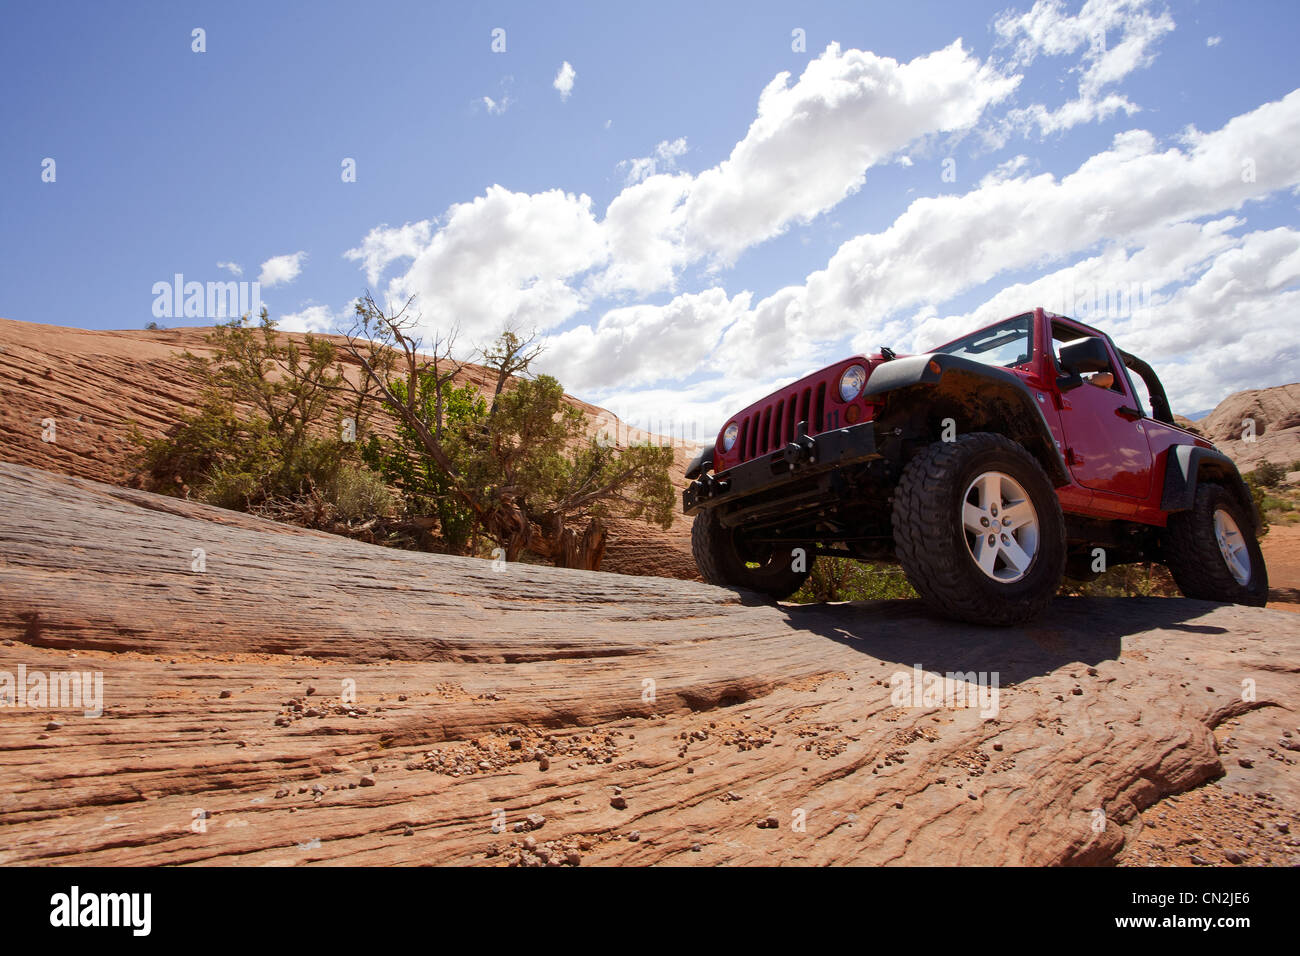 Jeep Driving on Red Rocks, Low Angle View, Moab, Utah, USA - Stock Image